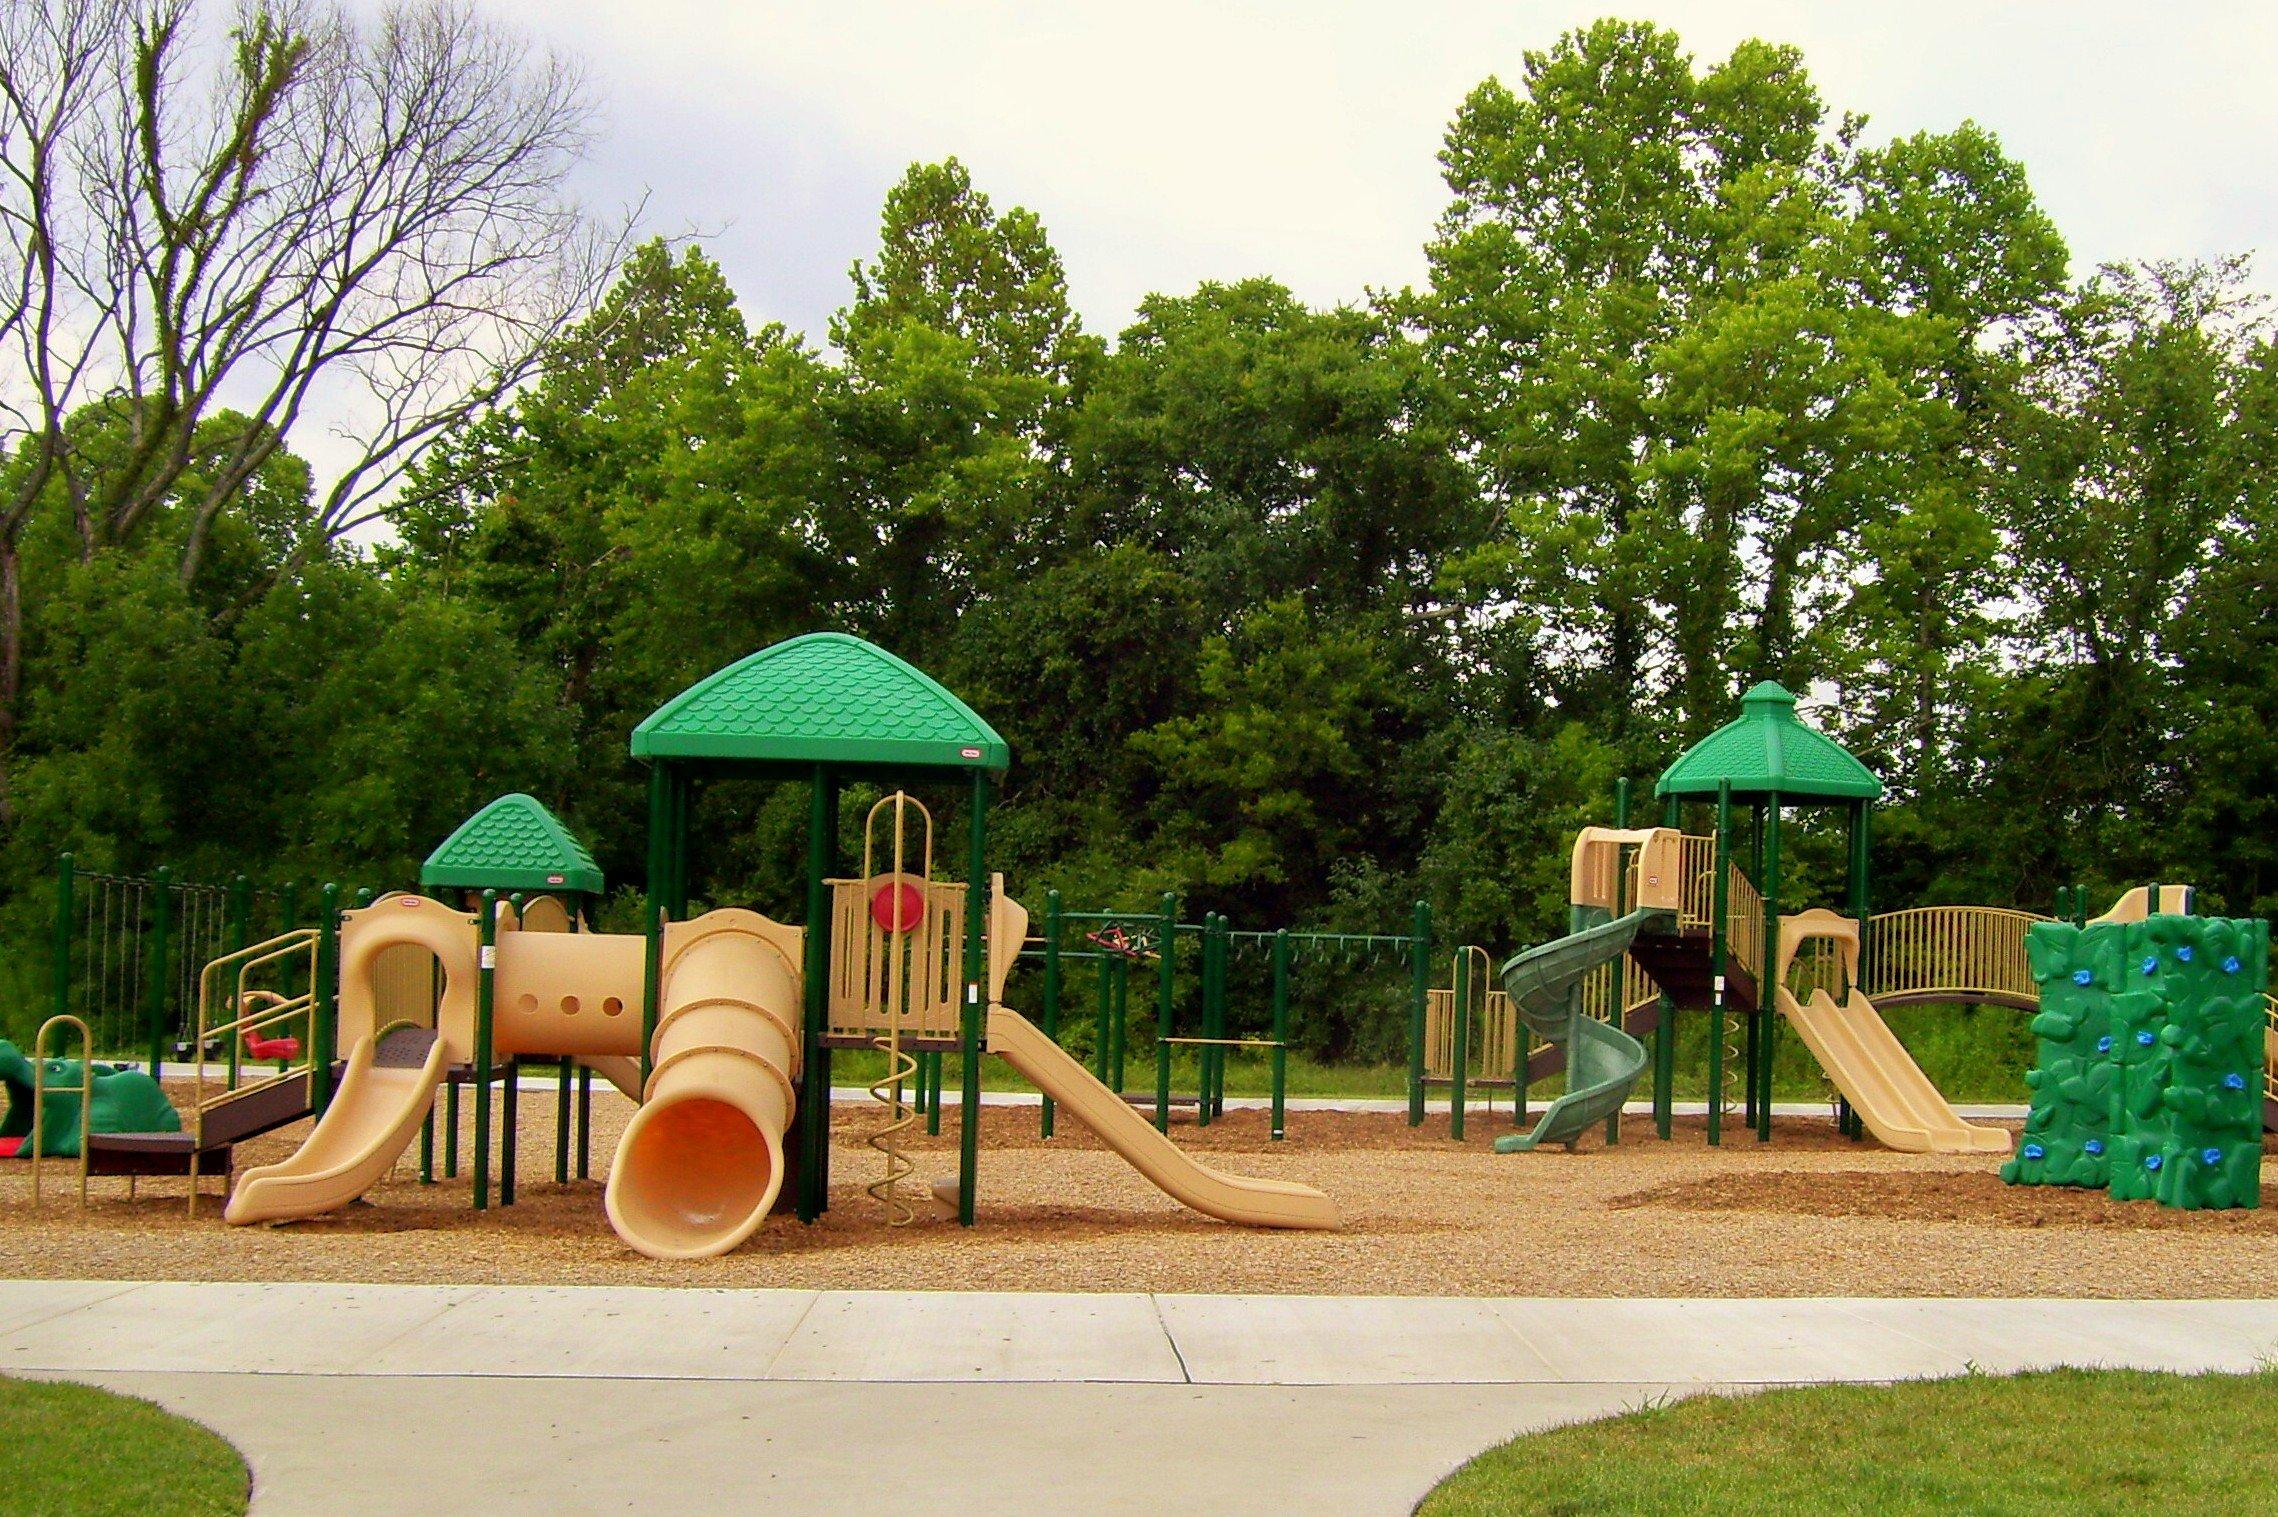 Park Backgrounds on Wallpapers Vista